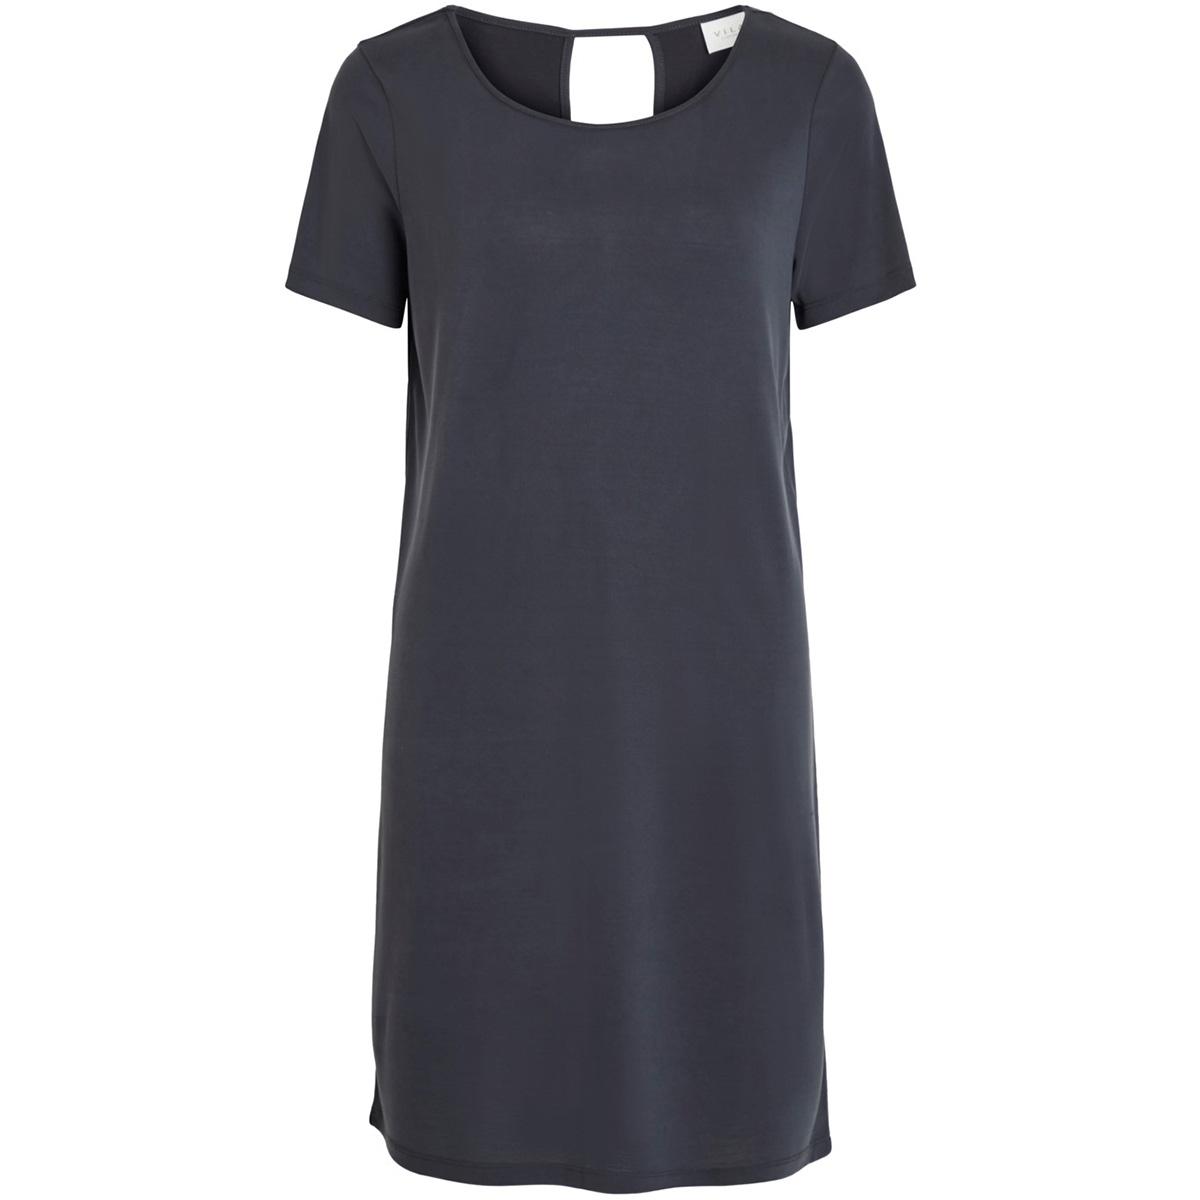 vitriny s/s dress-fav nx 14053486 vila jurk black